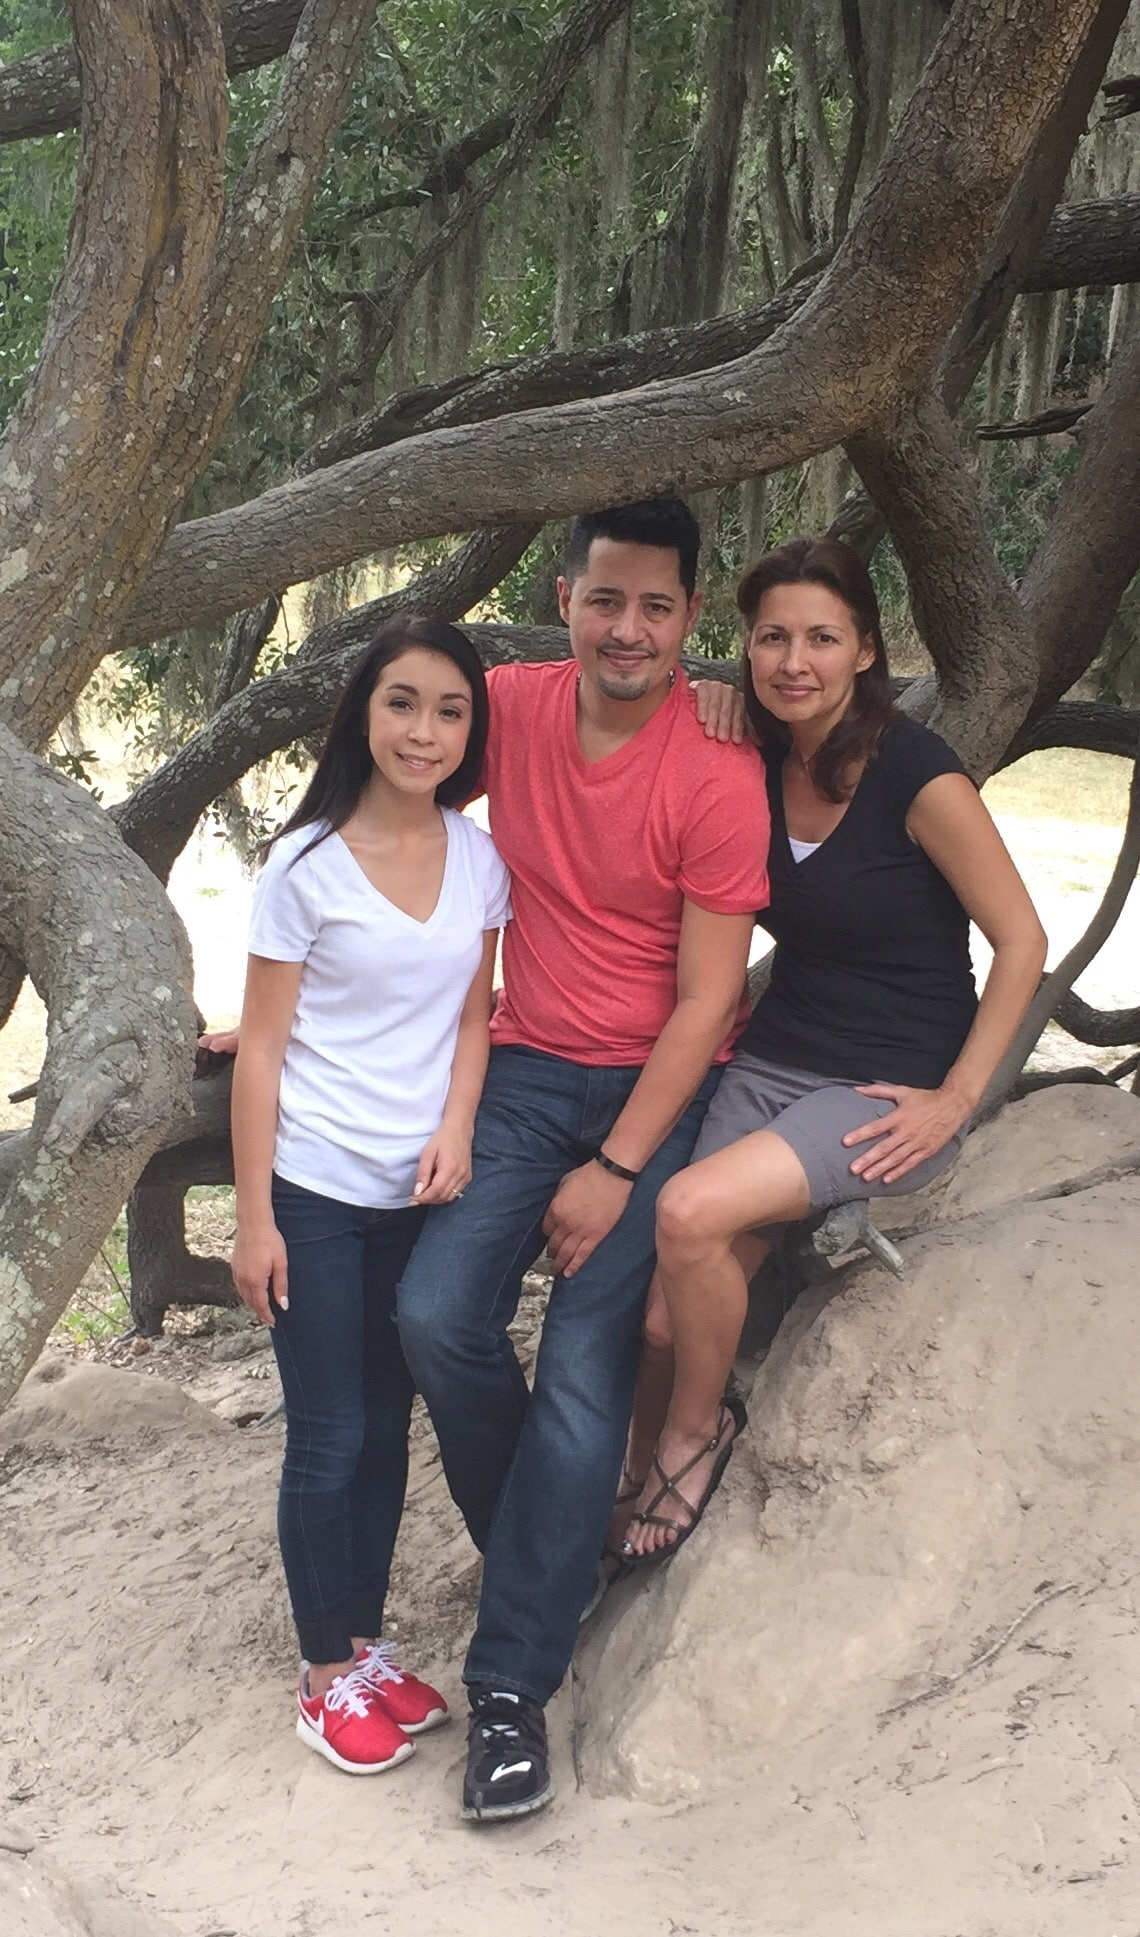 Adam, Cathy & Kat (Niece) Garcia